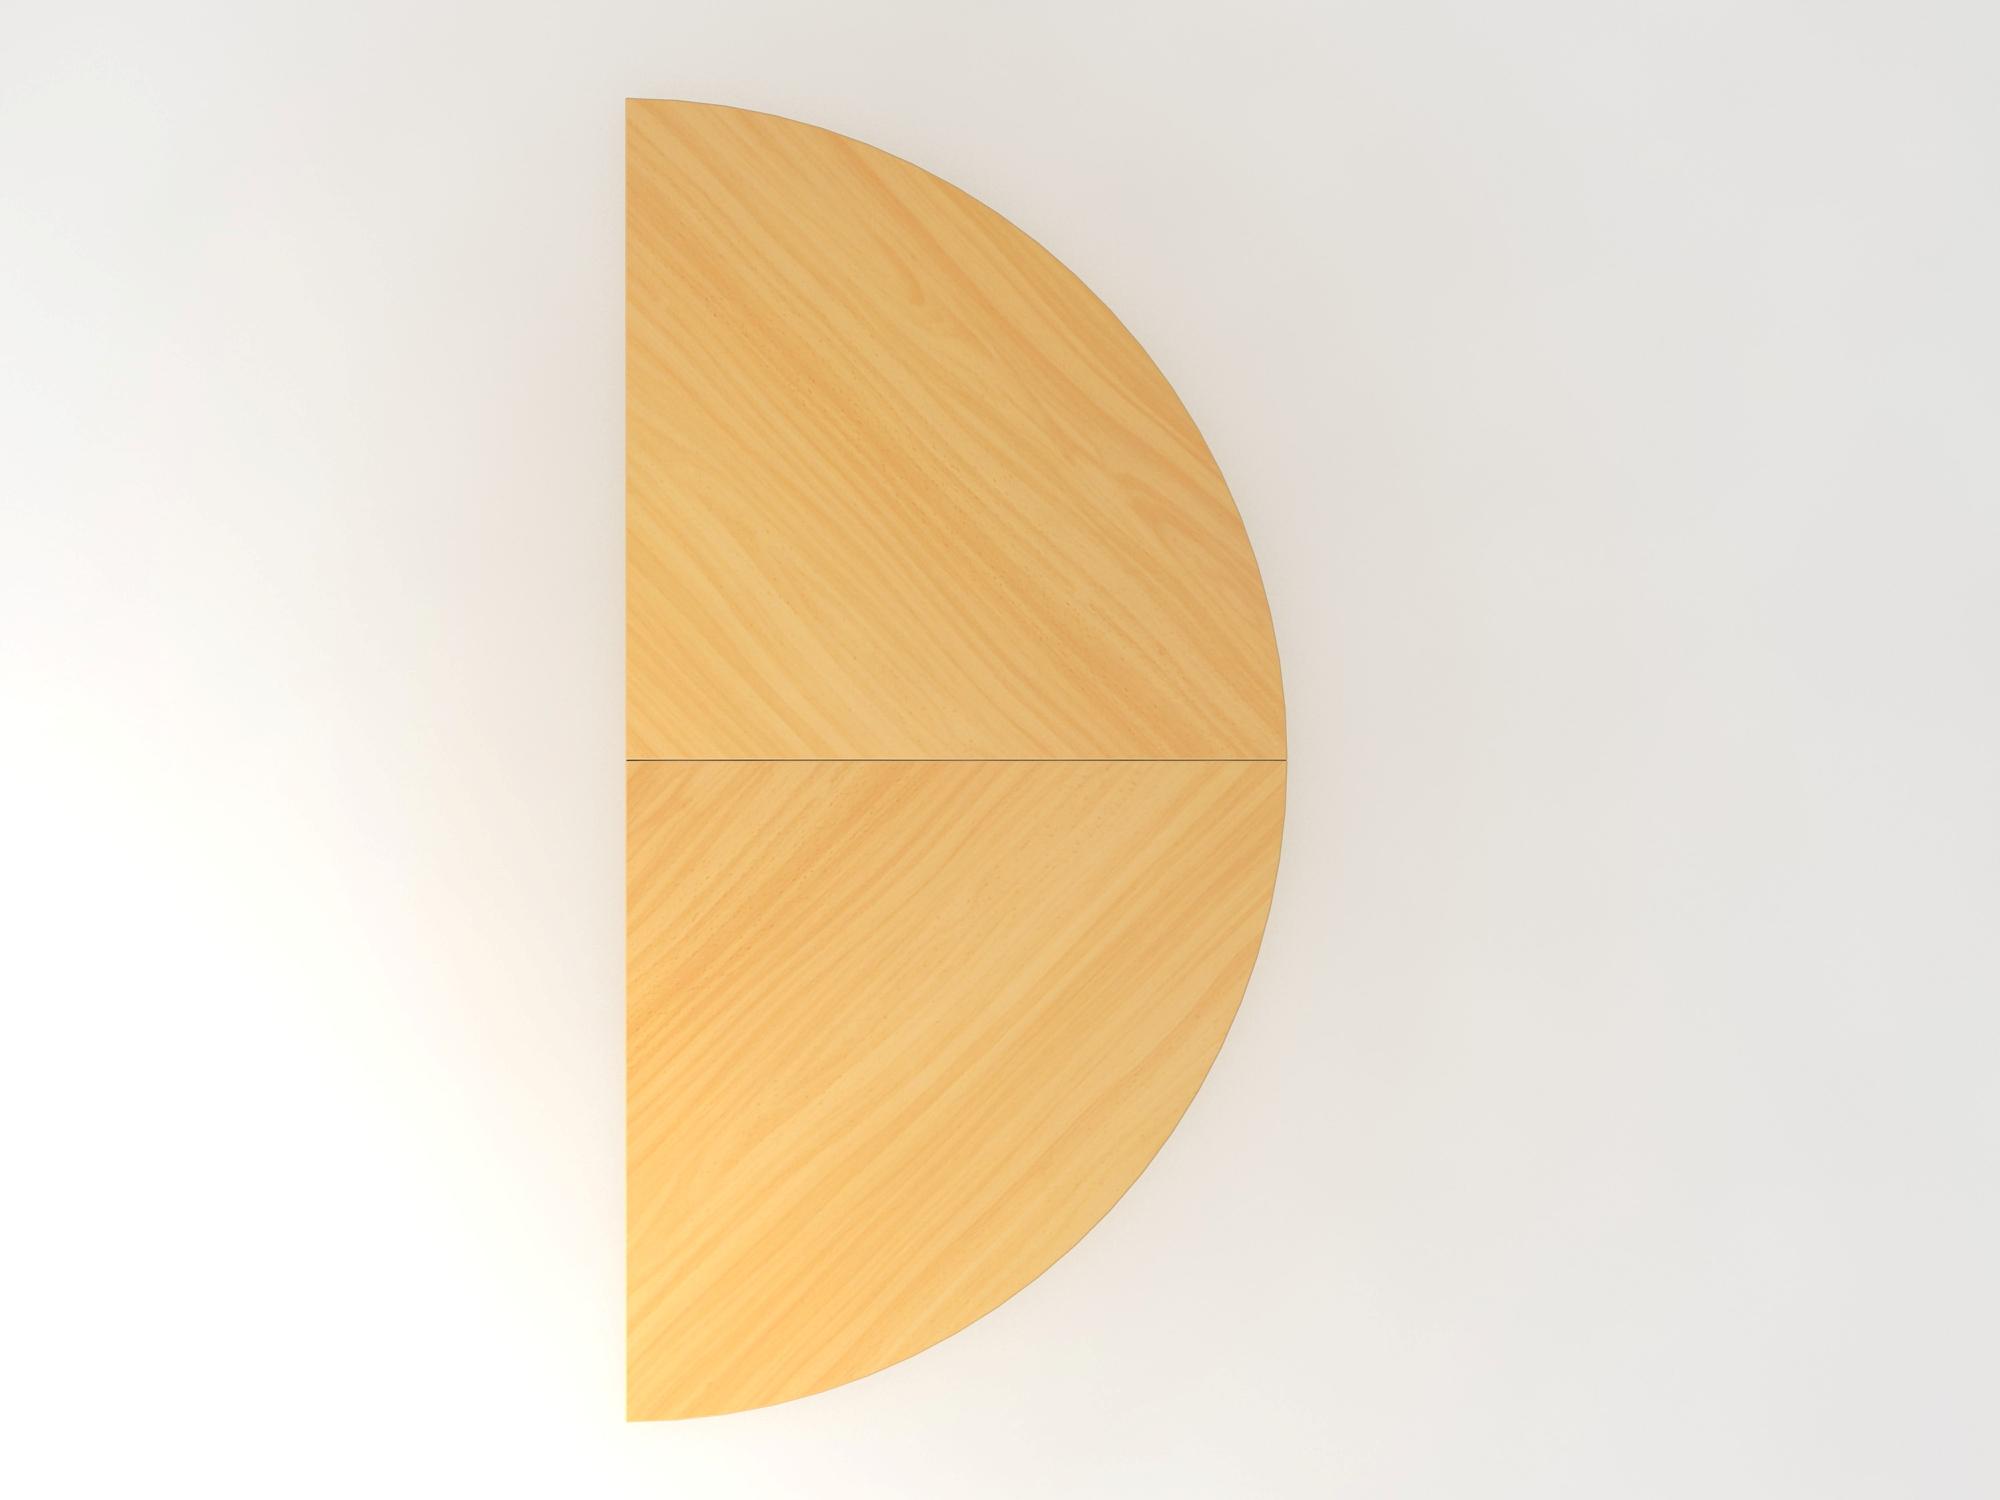 Anbautisch 2xViertelkreis/STF Buche/Chrom